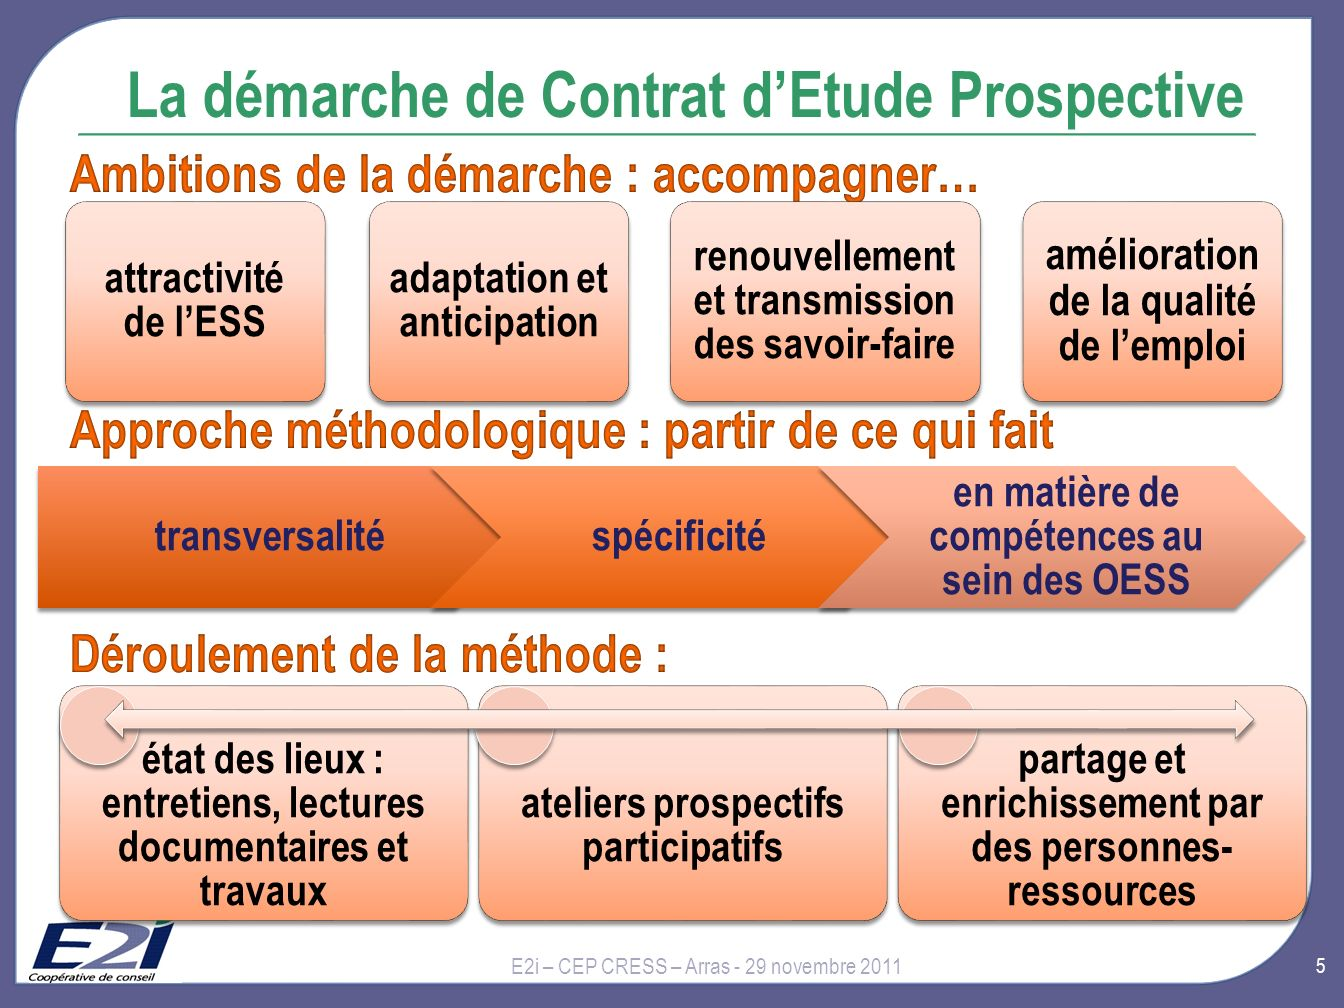 E2i – CEP CRESS – Arras - 29 novembre 2011 Merci de votre attention 36